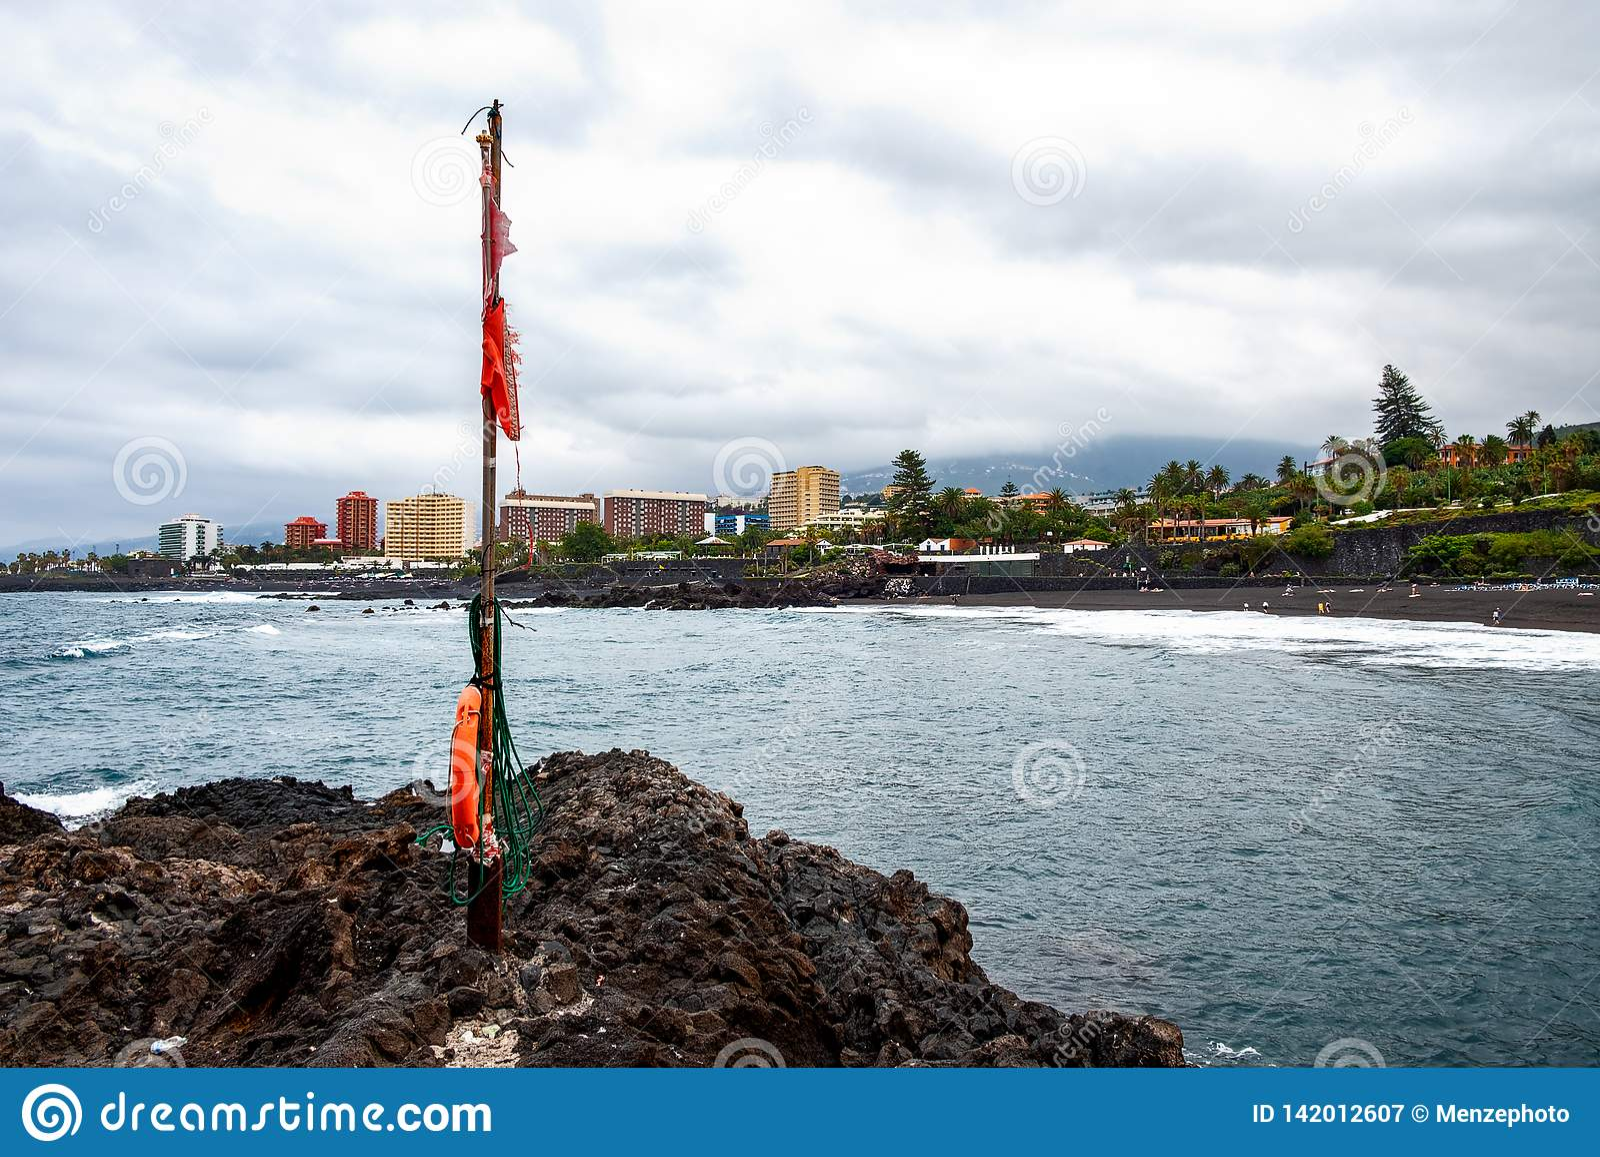 2019-03-12 Punta Brava - Puerto de la Cruz, Santa Cruz de Tenerife lilla staden på den atlantiska kusten